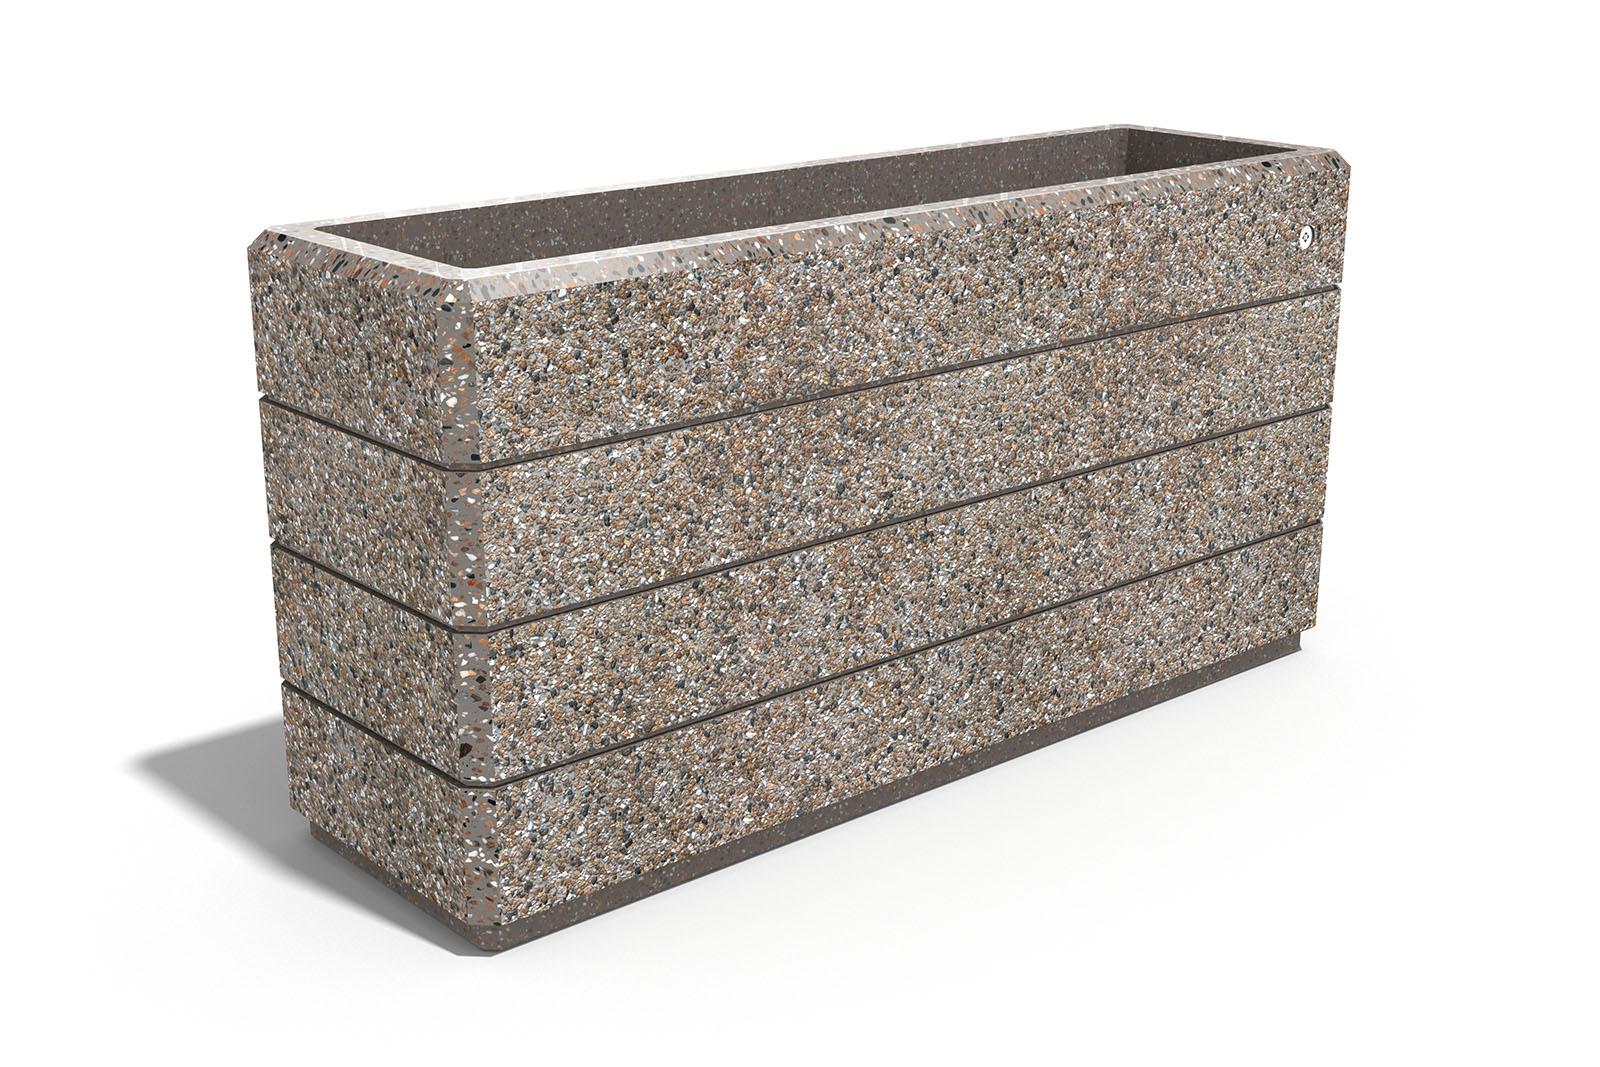 Pflanzkübel Waschbeton.Rectangular Concrete Planter Model 132